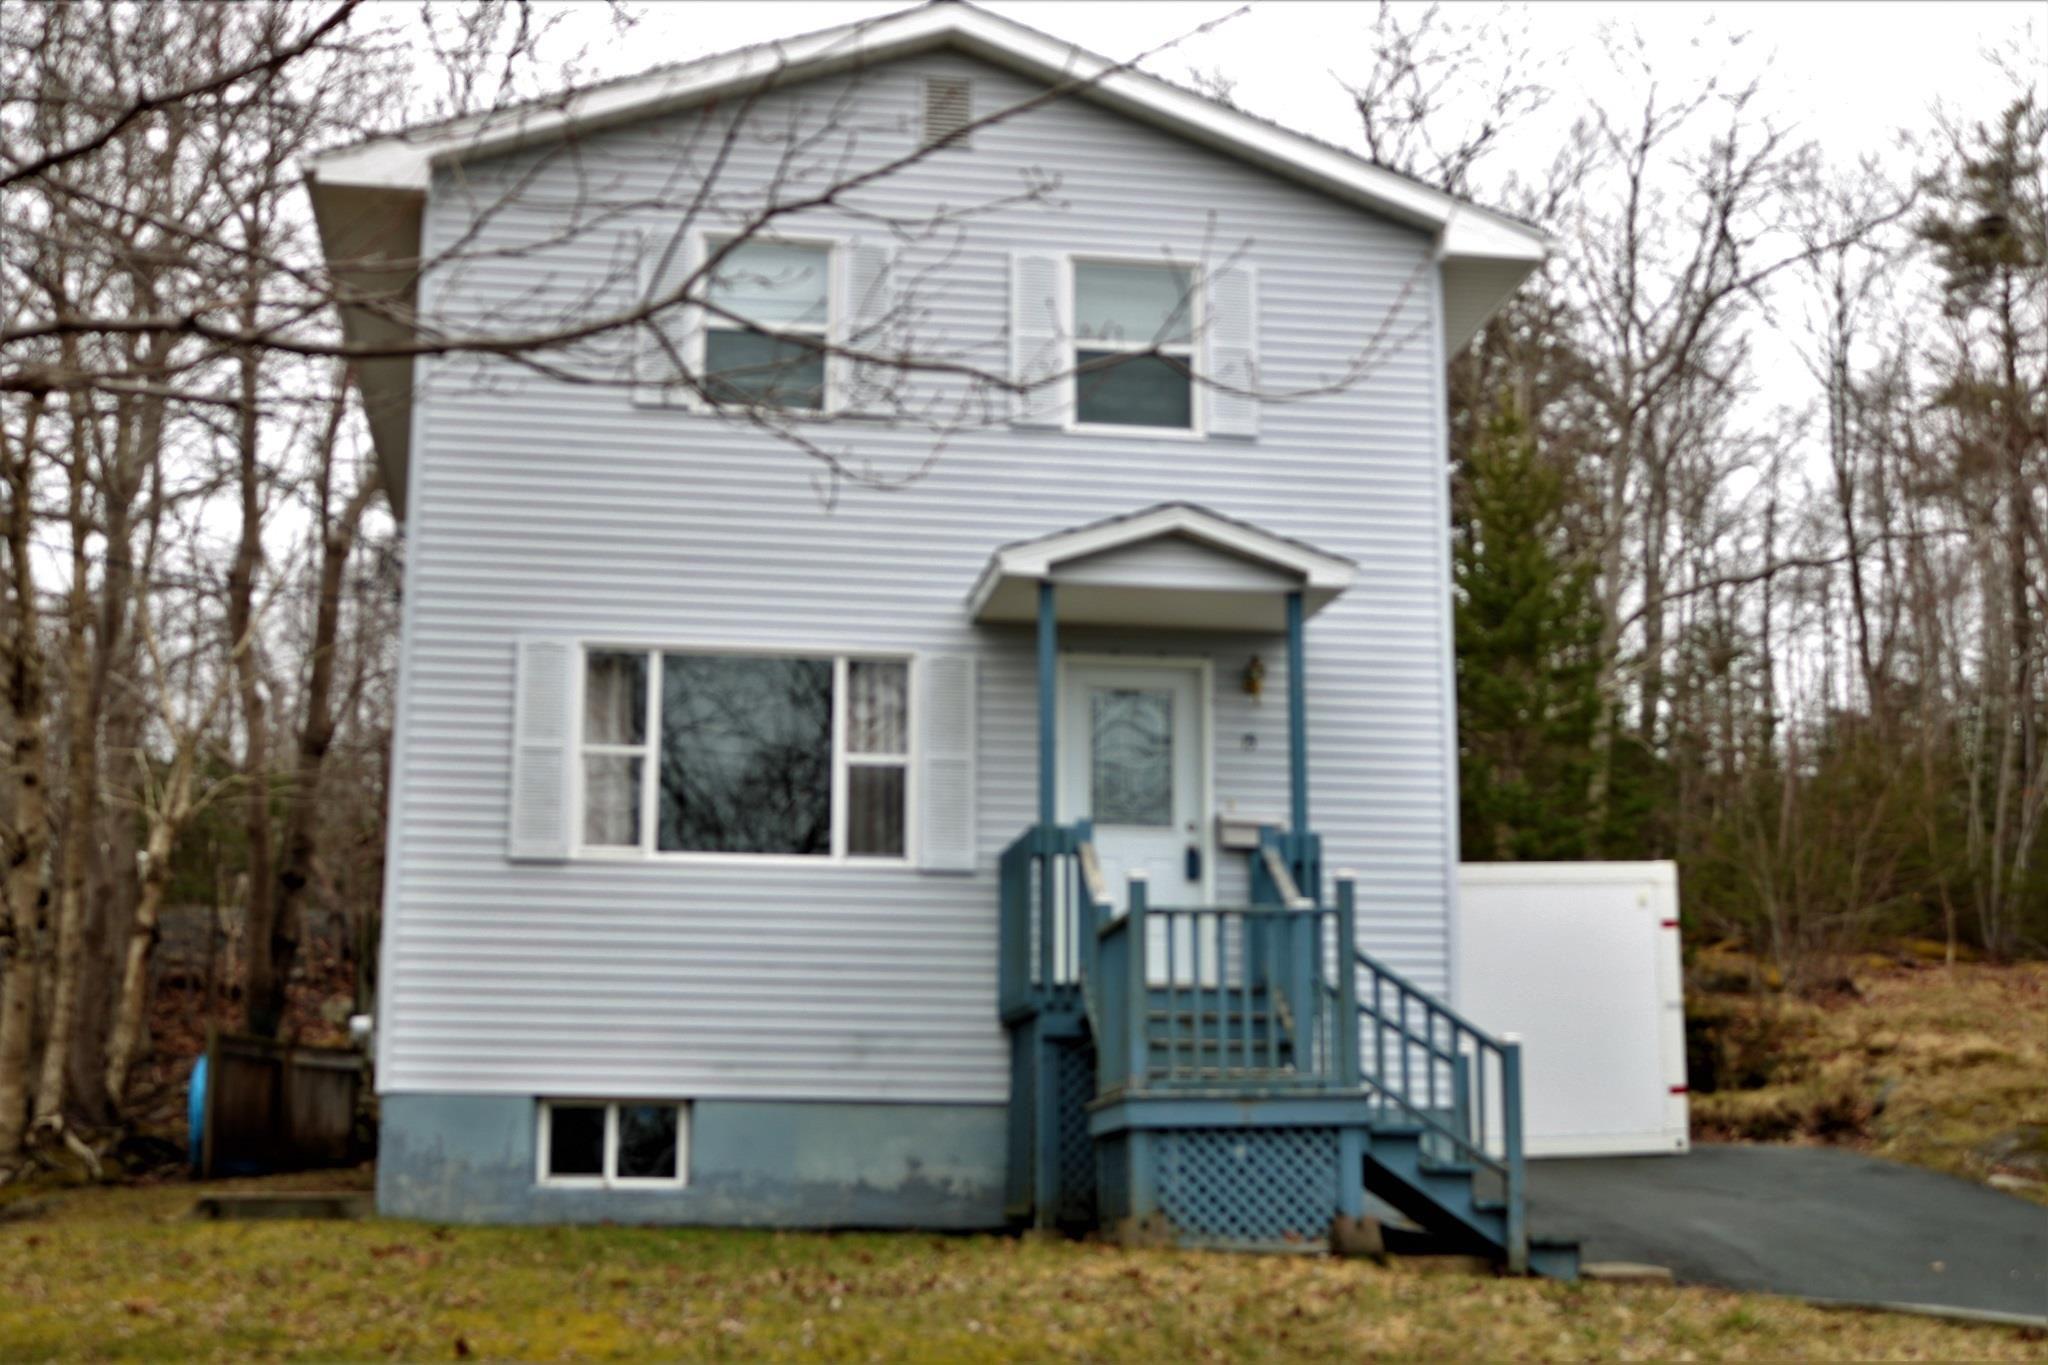 Main Photo: 15 Mansion Avenue in Halifax: 7-Spryfield Residential for sale (Halifax-Dartmouth)  : MLS®# 202107255